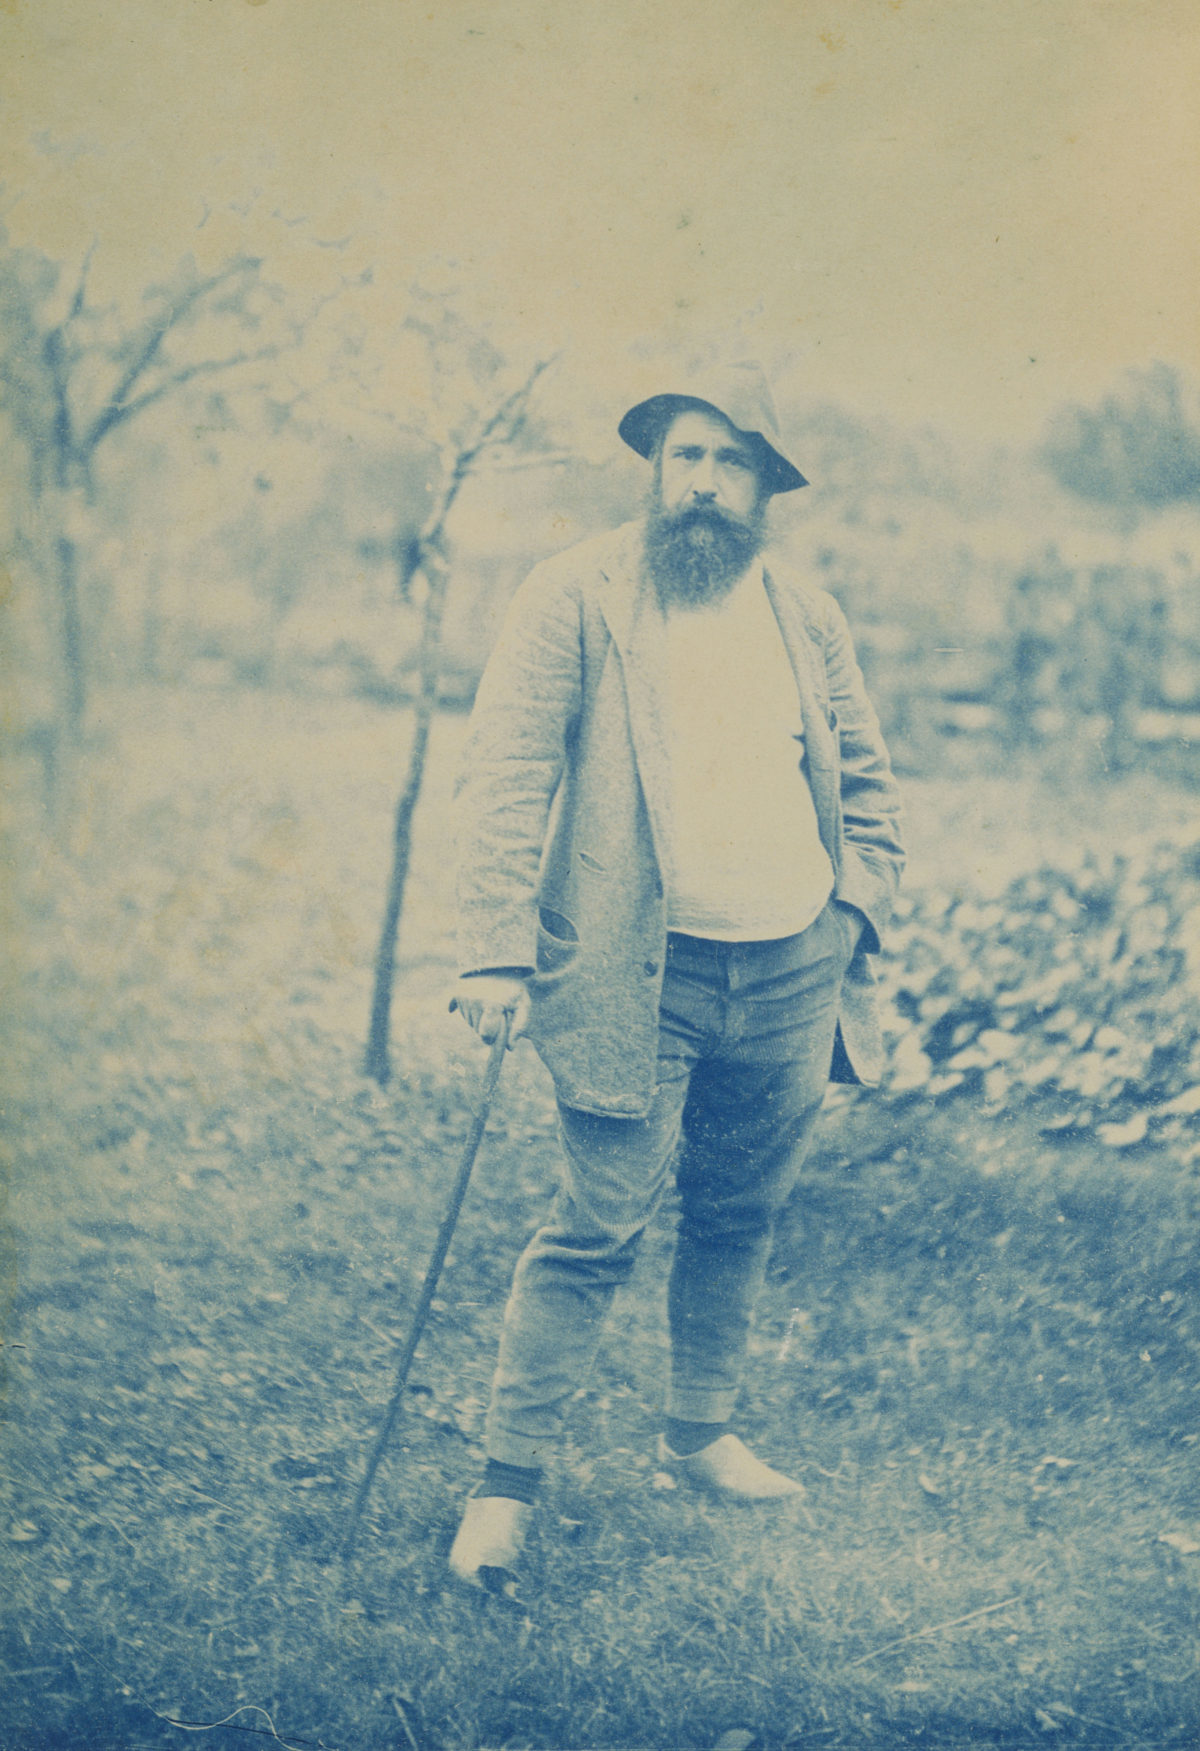 Claude Monet fotografiert von Theodore Robinson, 1888/90 (Foto: Terra Foundation for American Art, Chicago/Art Ressource, NY)